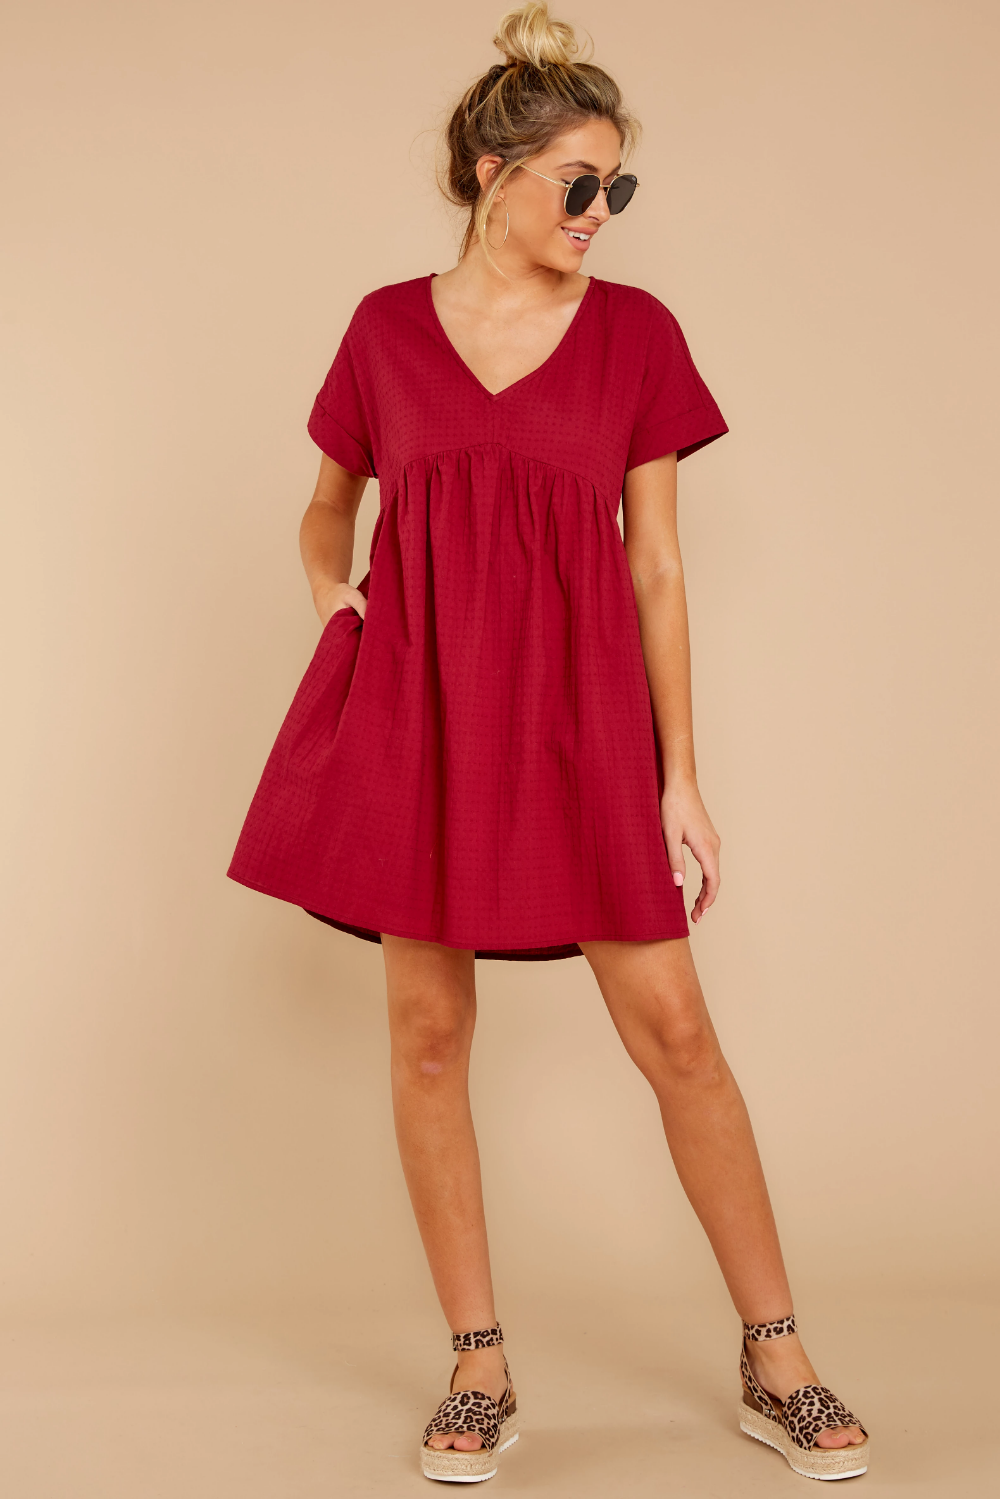 Cute Burgundy Babydoll Dress Short Sleeve Shift Dress Dress 42 Red Dress Short Sleeve Shift Dress Dresses Short Sleeve Dresses [ 1499 x 1000 Pixel ]